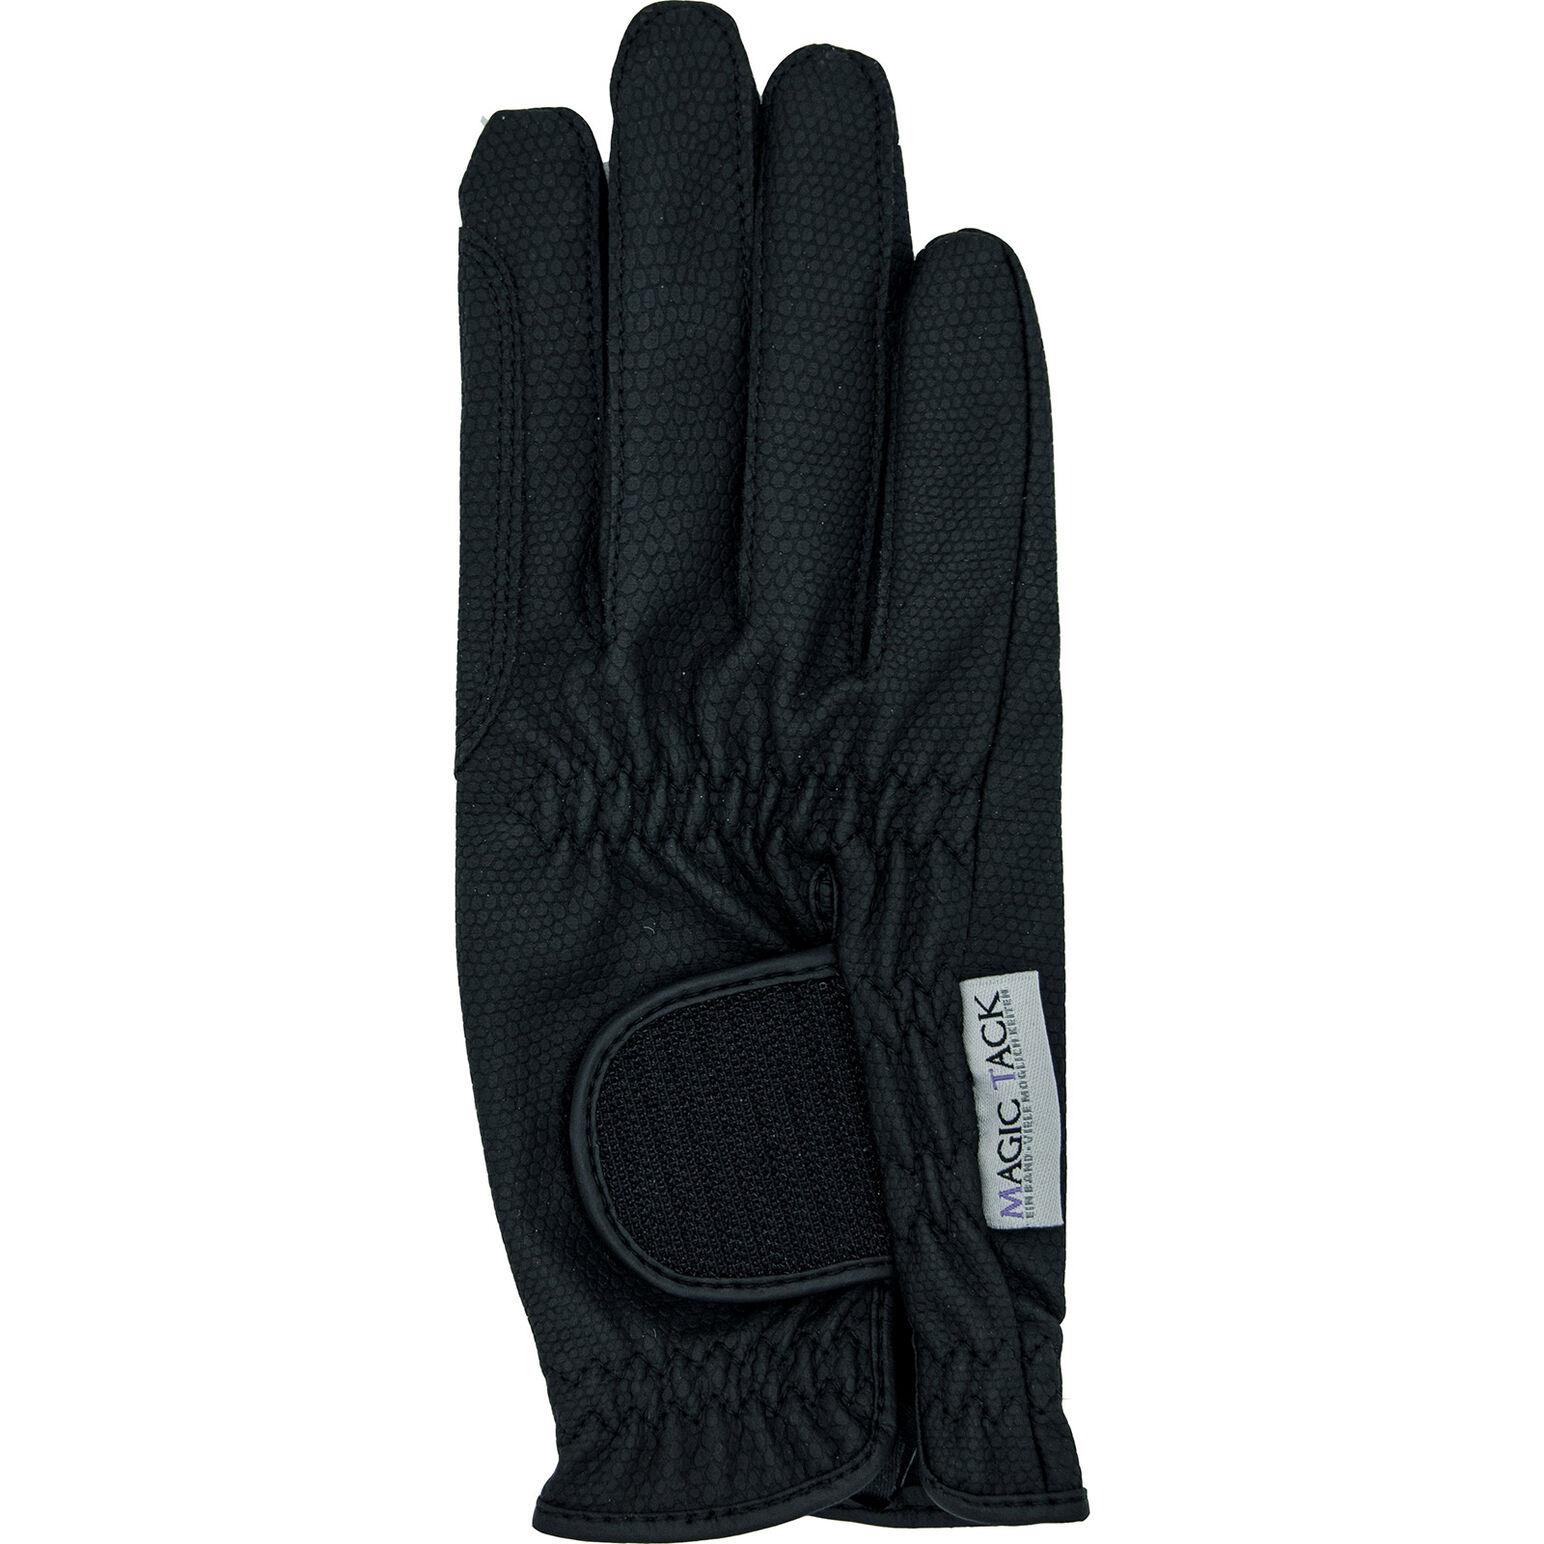 haukeschmidt A Touch of Magic Tack Handschuh Patches Magic Tack Muster Mixed Handschuhfarben wei/ß